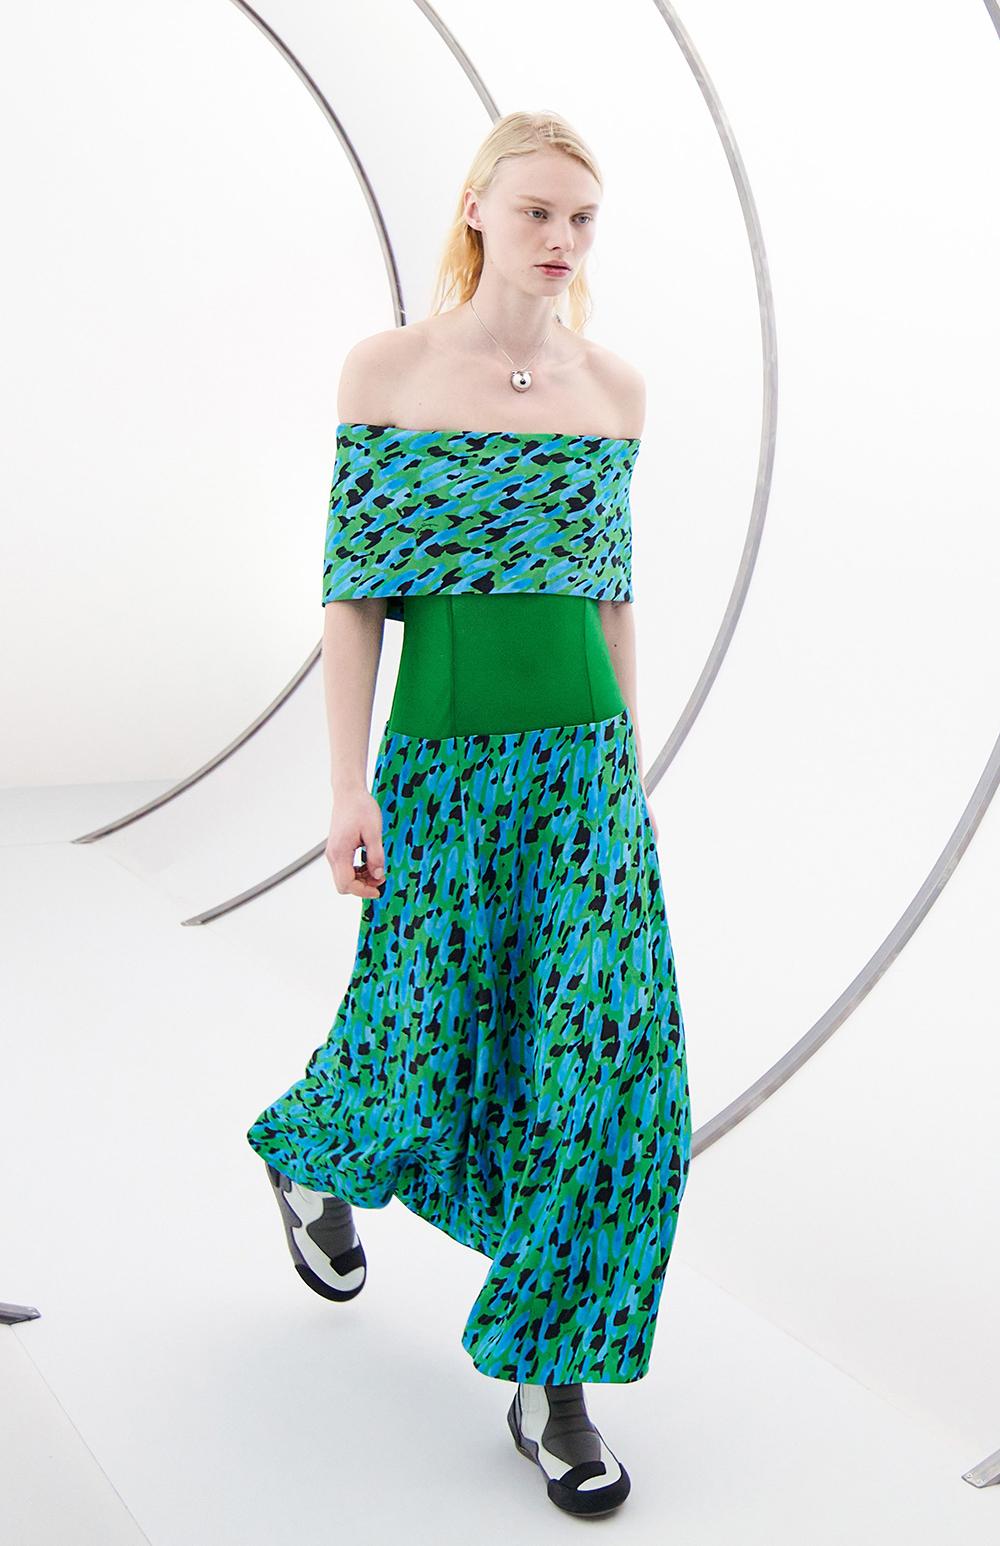 Best MFW Looks I Salvatore Ferragamo Fall 2021 Collection #fashionstyle #fashionblog